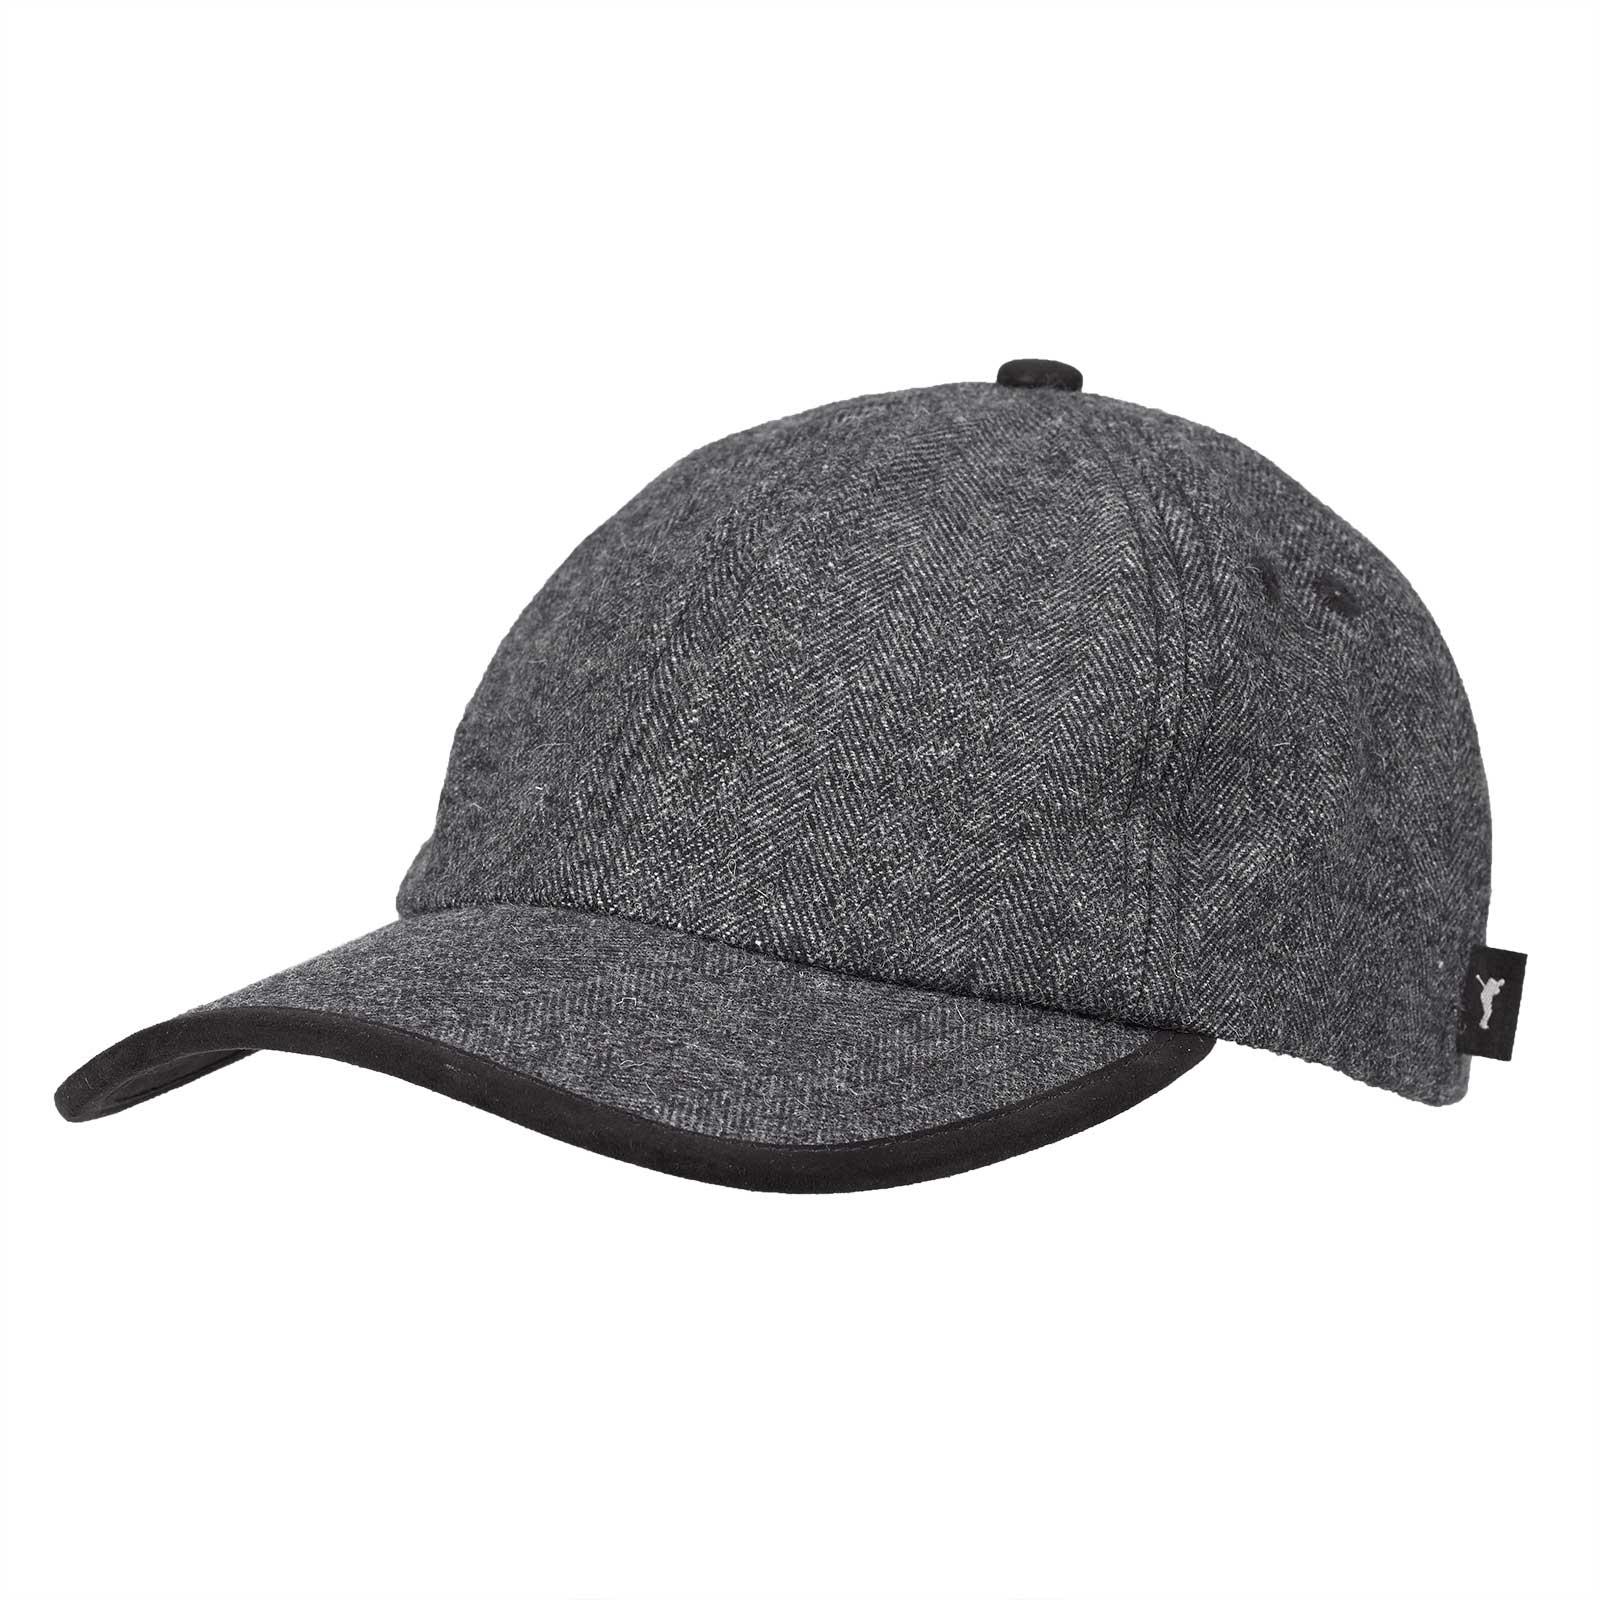 Premium Casual Herren Funktions-Golfcap mit Fischgrätmuster